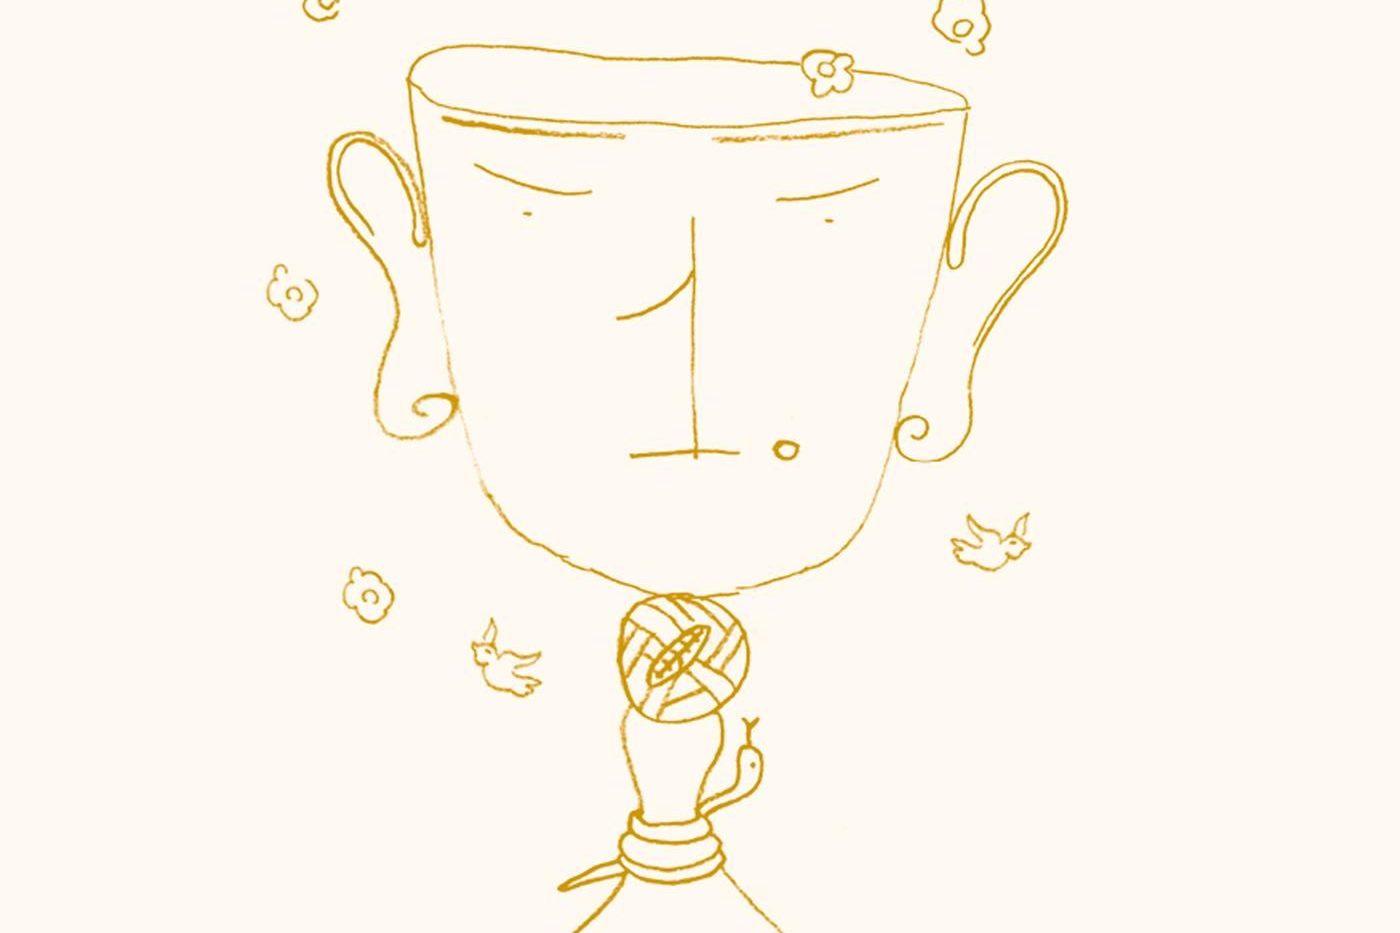 Puchar od Pana Boga, Oto Pavel